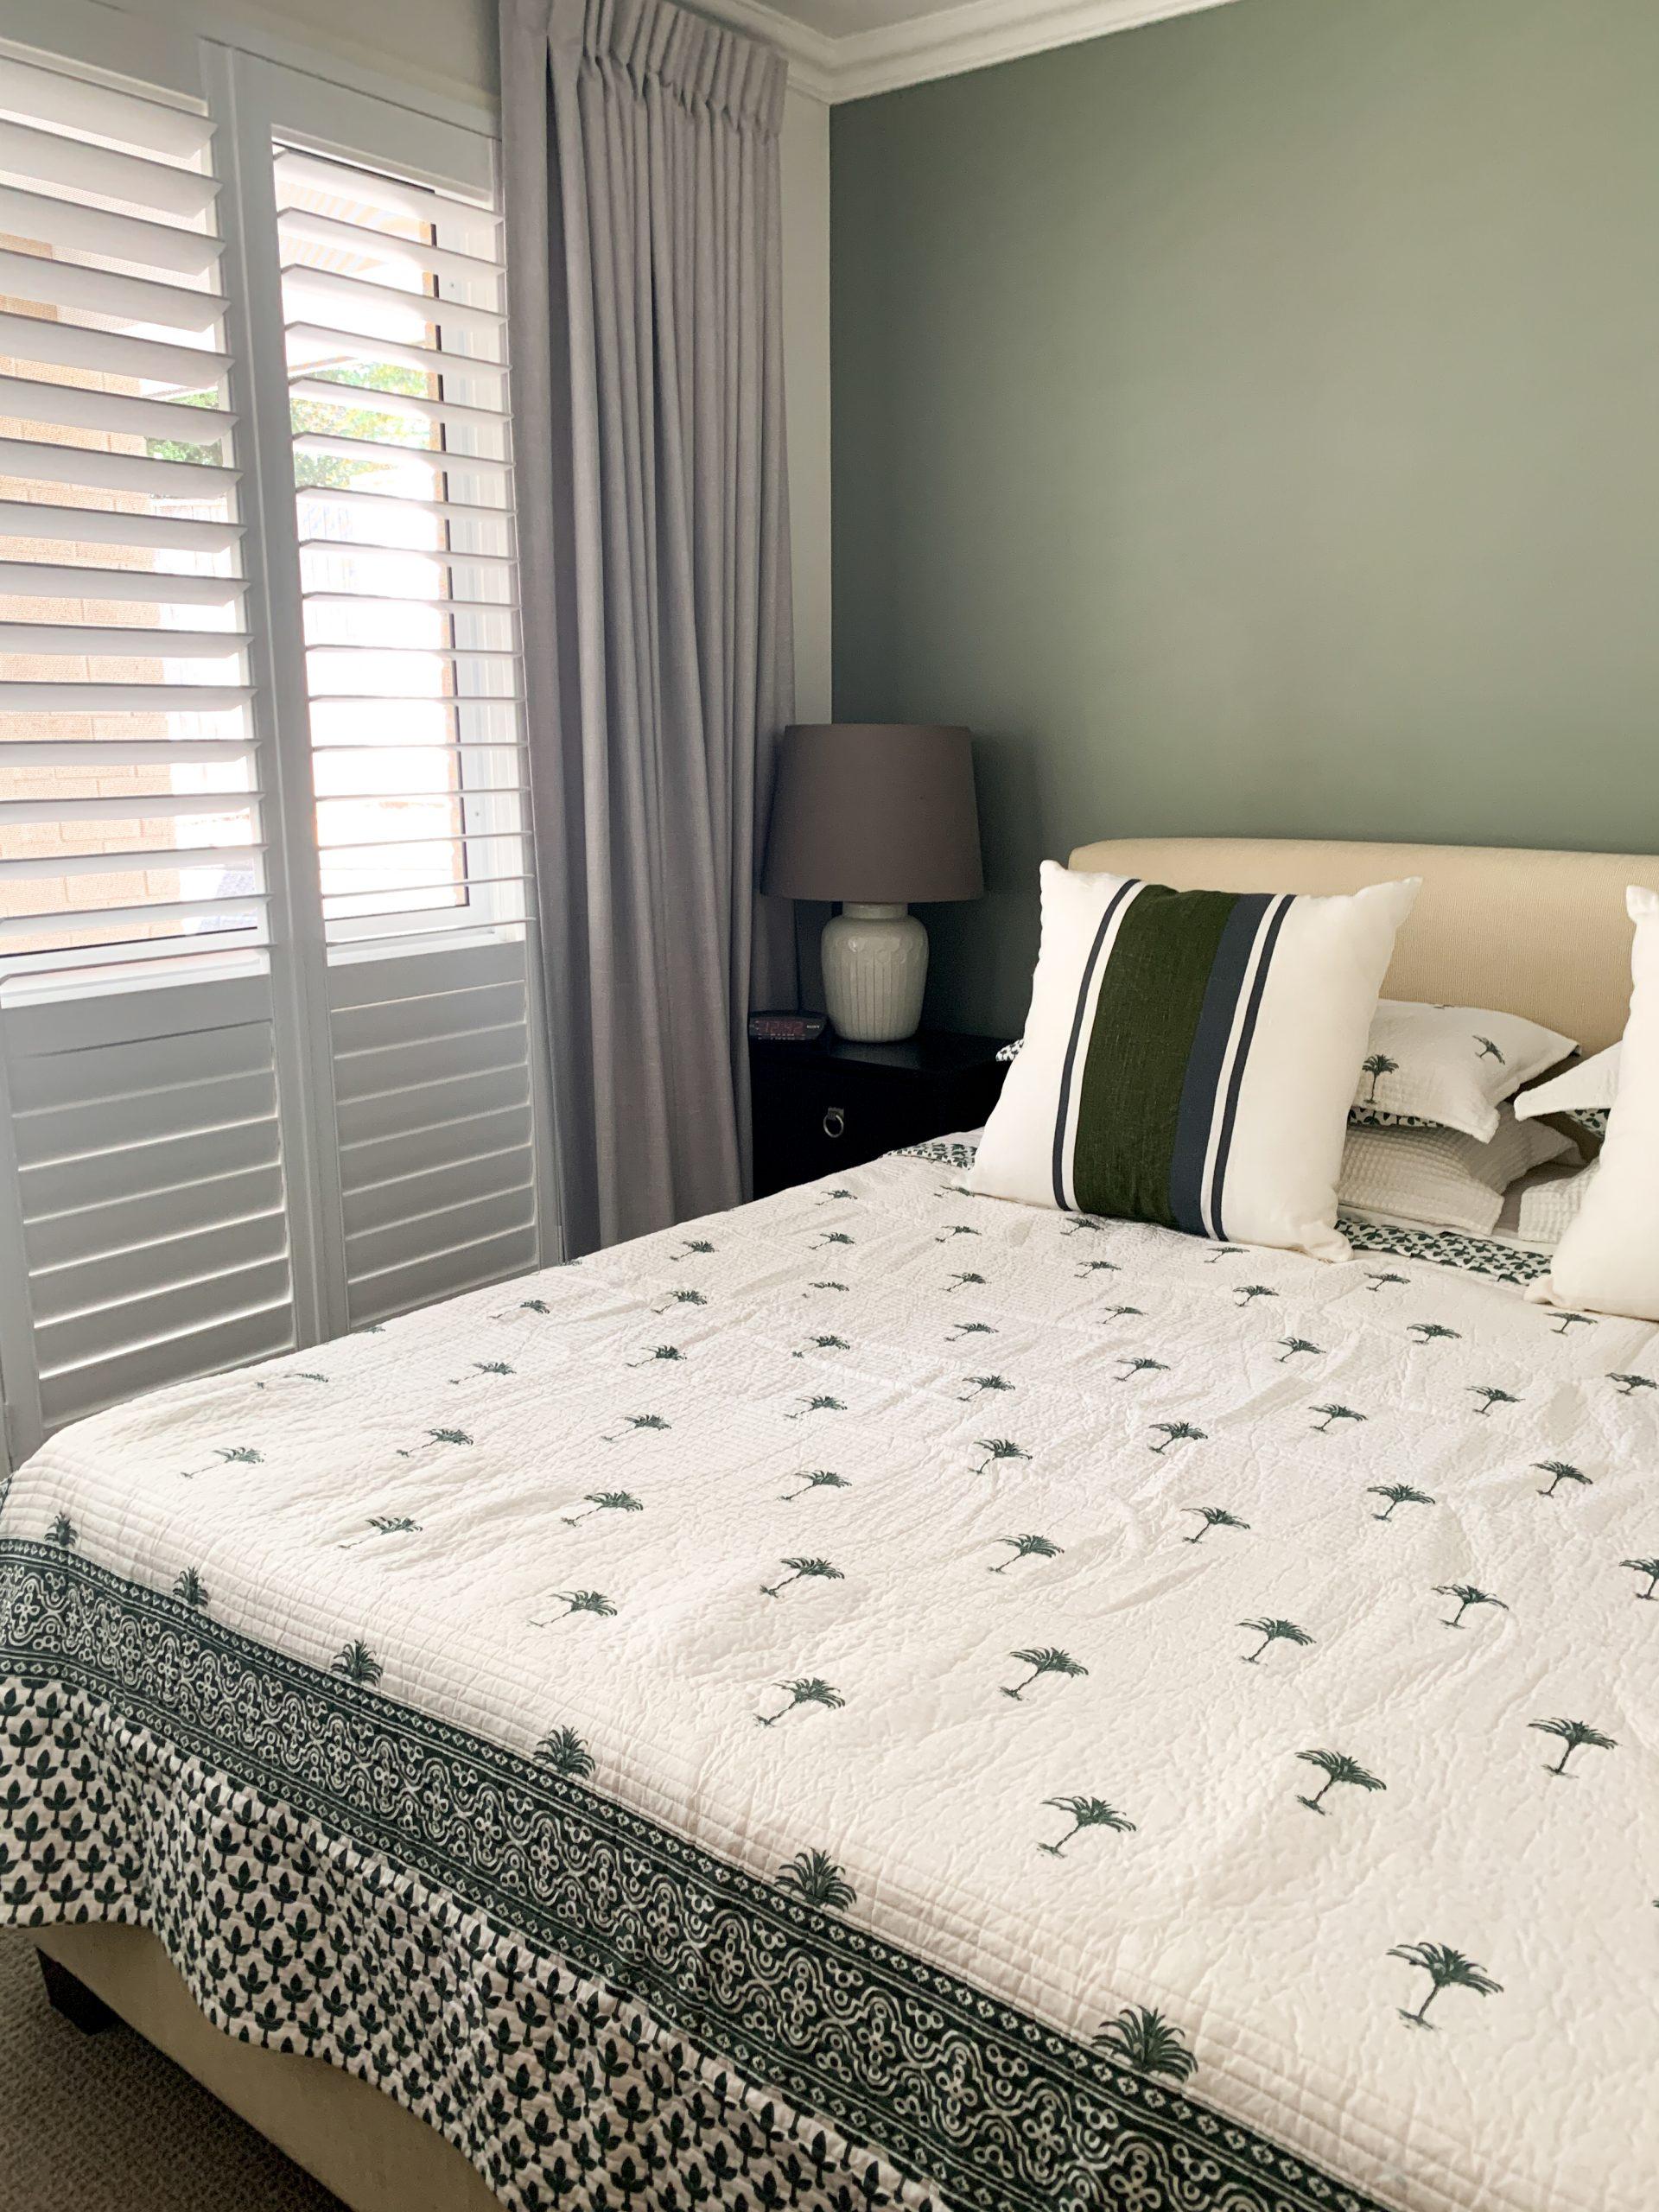 https://www.ivyandfinch.com.au/wp-content/uploads/2021/02/The-Gap-Interior-Design-Master-Bedroom-scaled.jpg